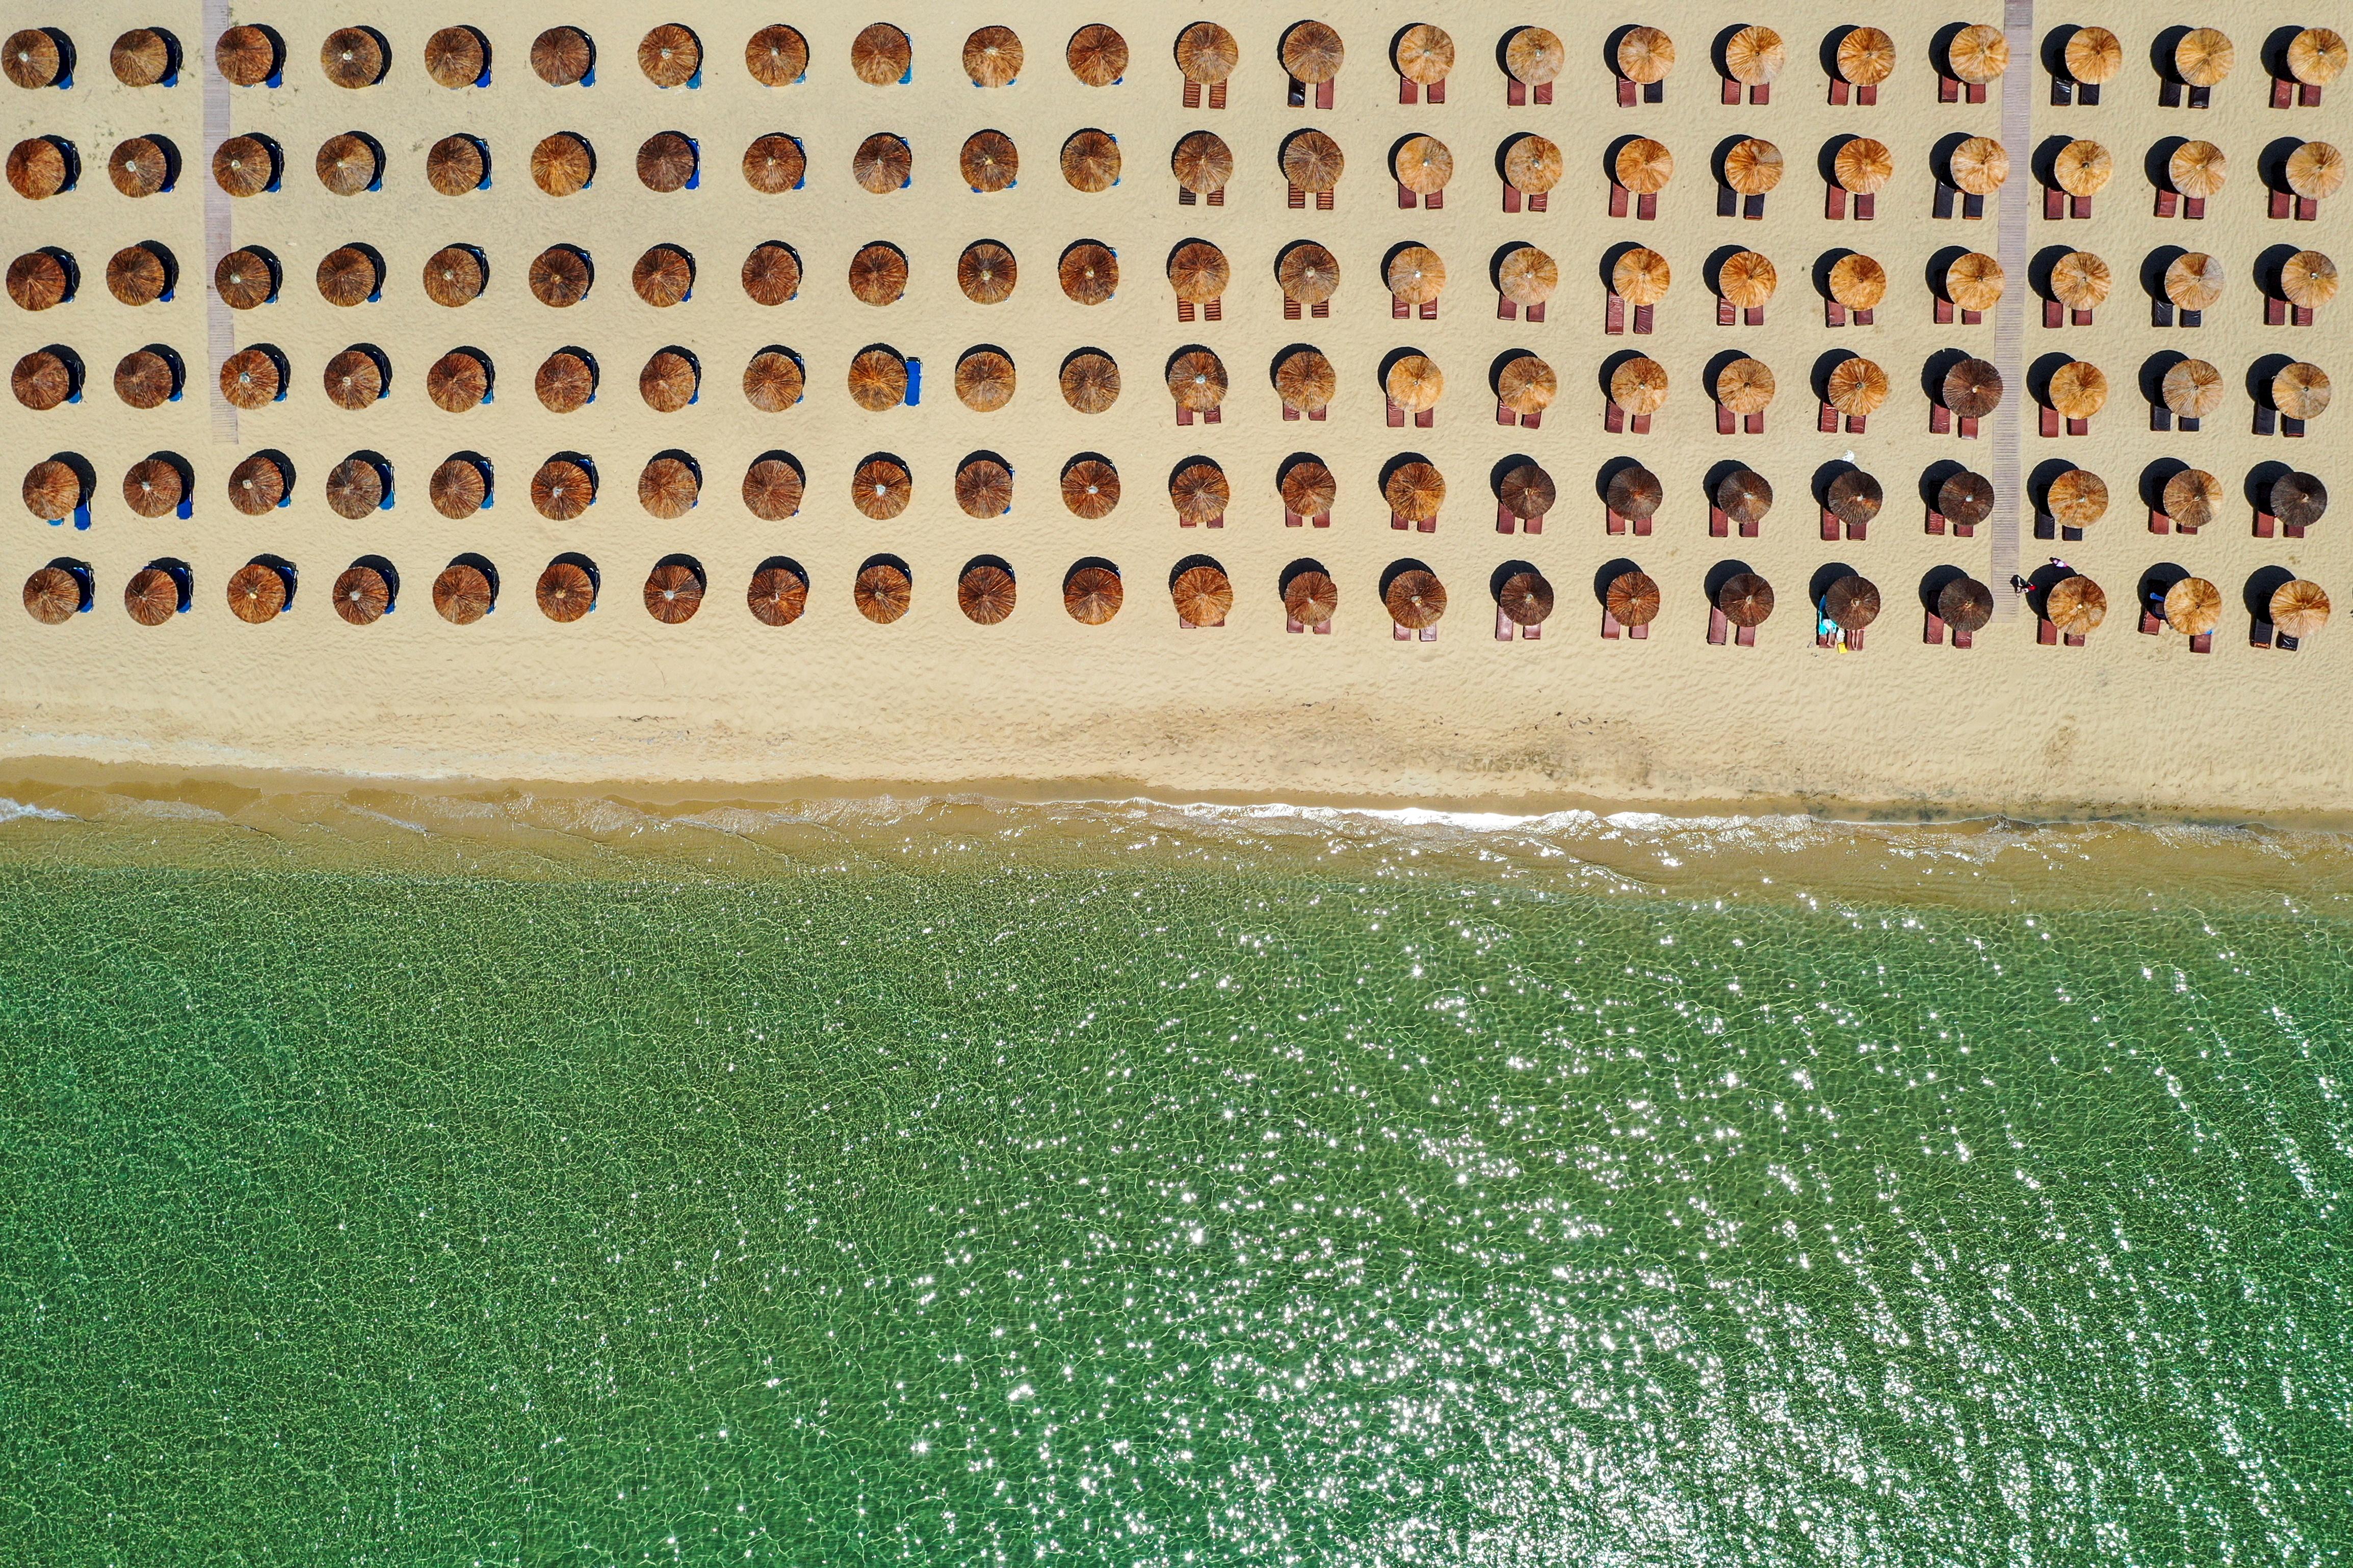 An aerial view shows umbrellas on the Ammolofoi beach in Nea Peramos, Greece June 5, 2021. Picture taken with a drone June 5, 2021. REUTERS/Alexandros Avramidis